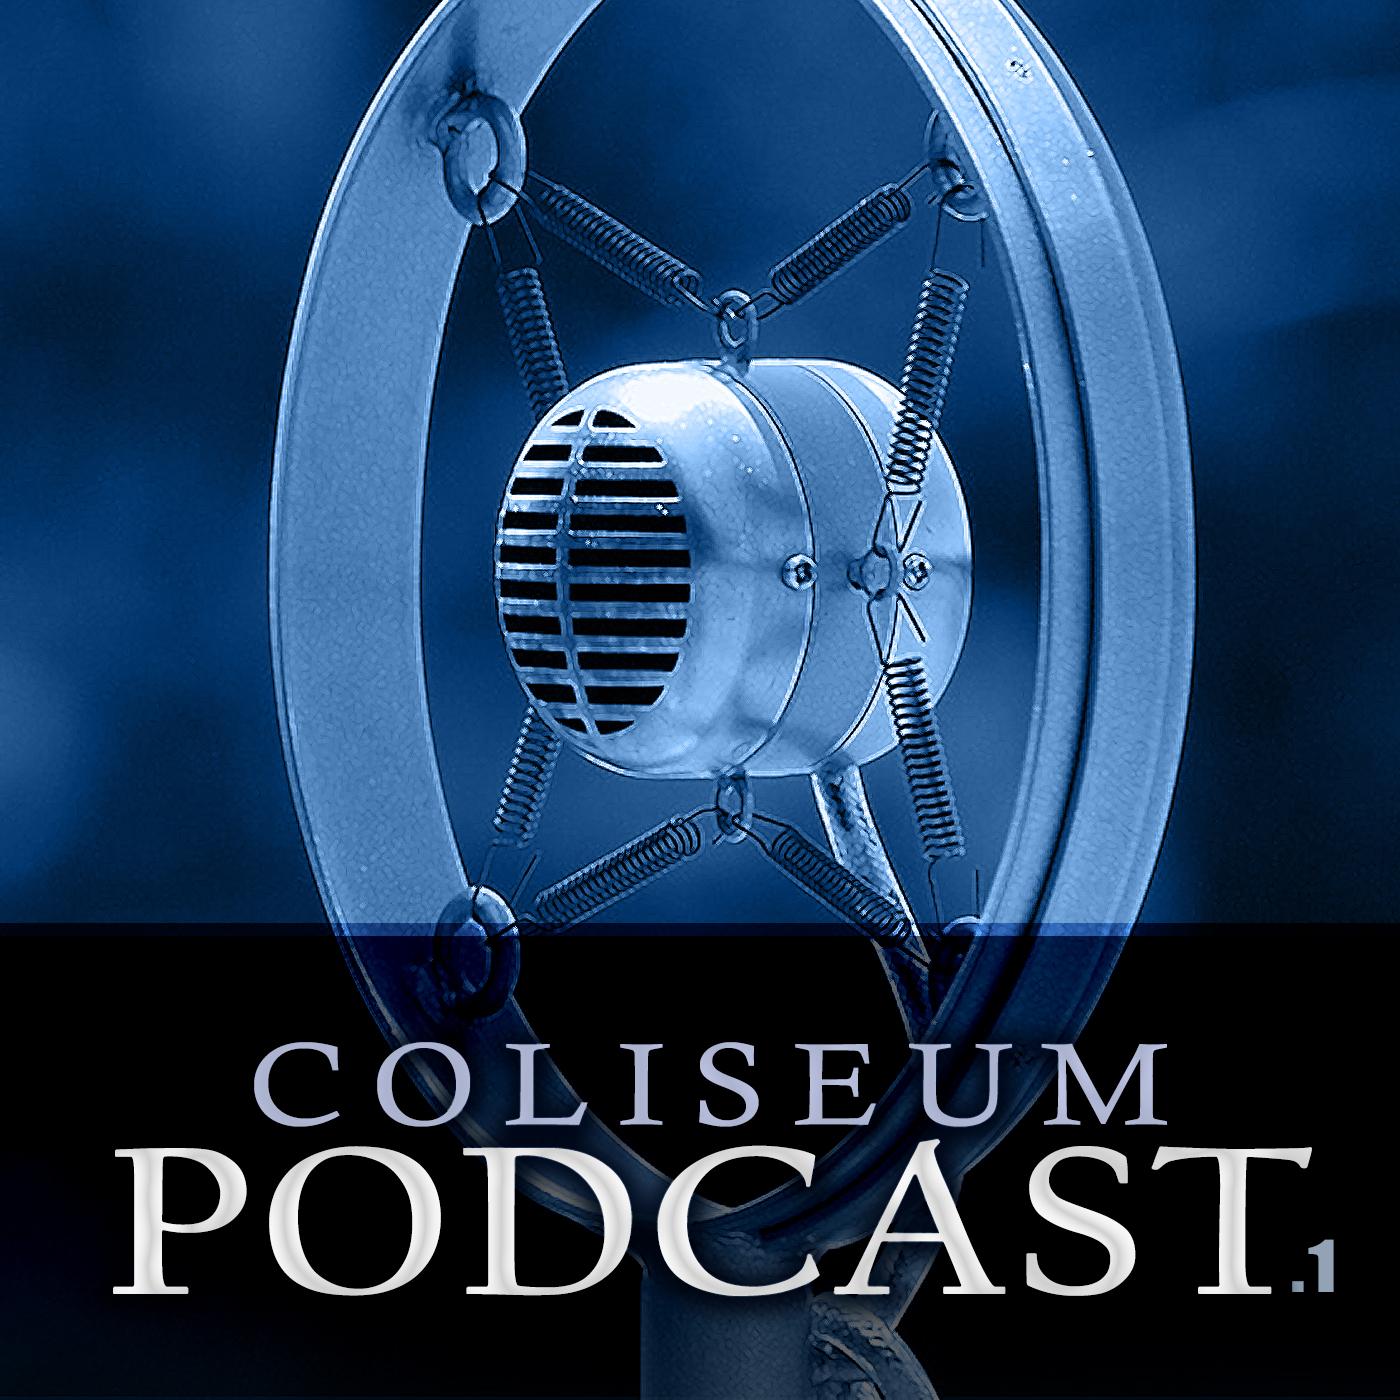 Coliseum Podcast